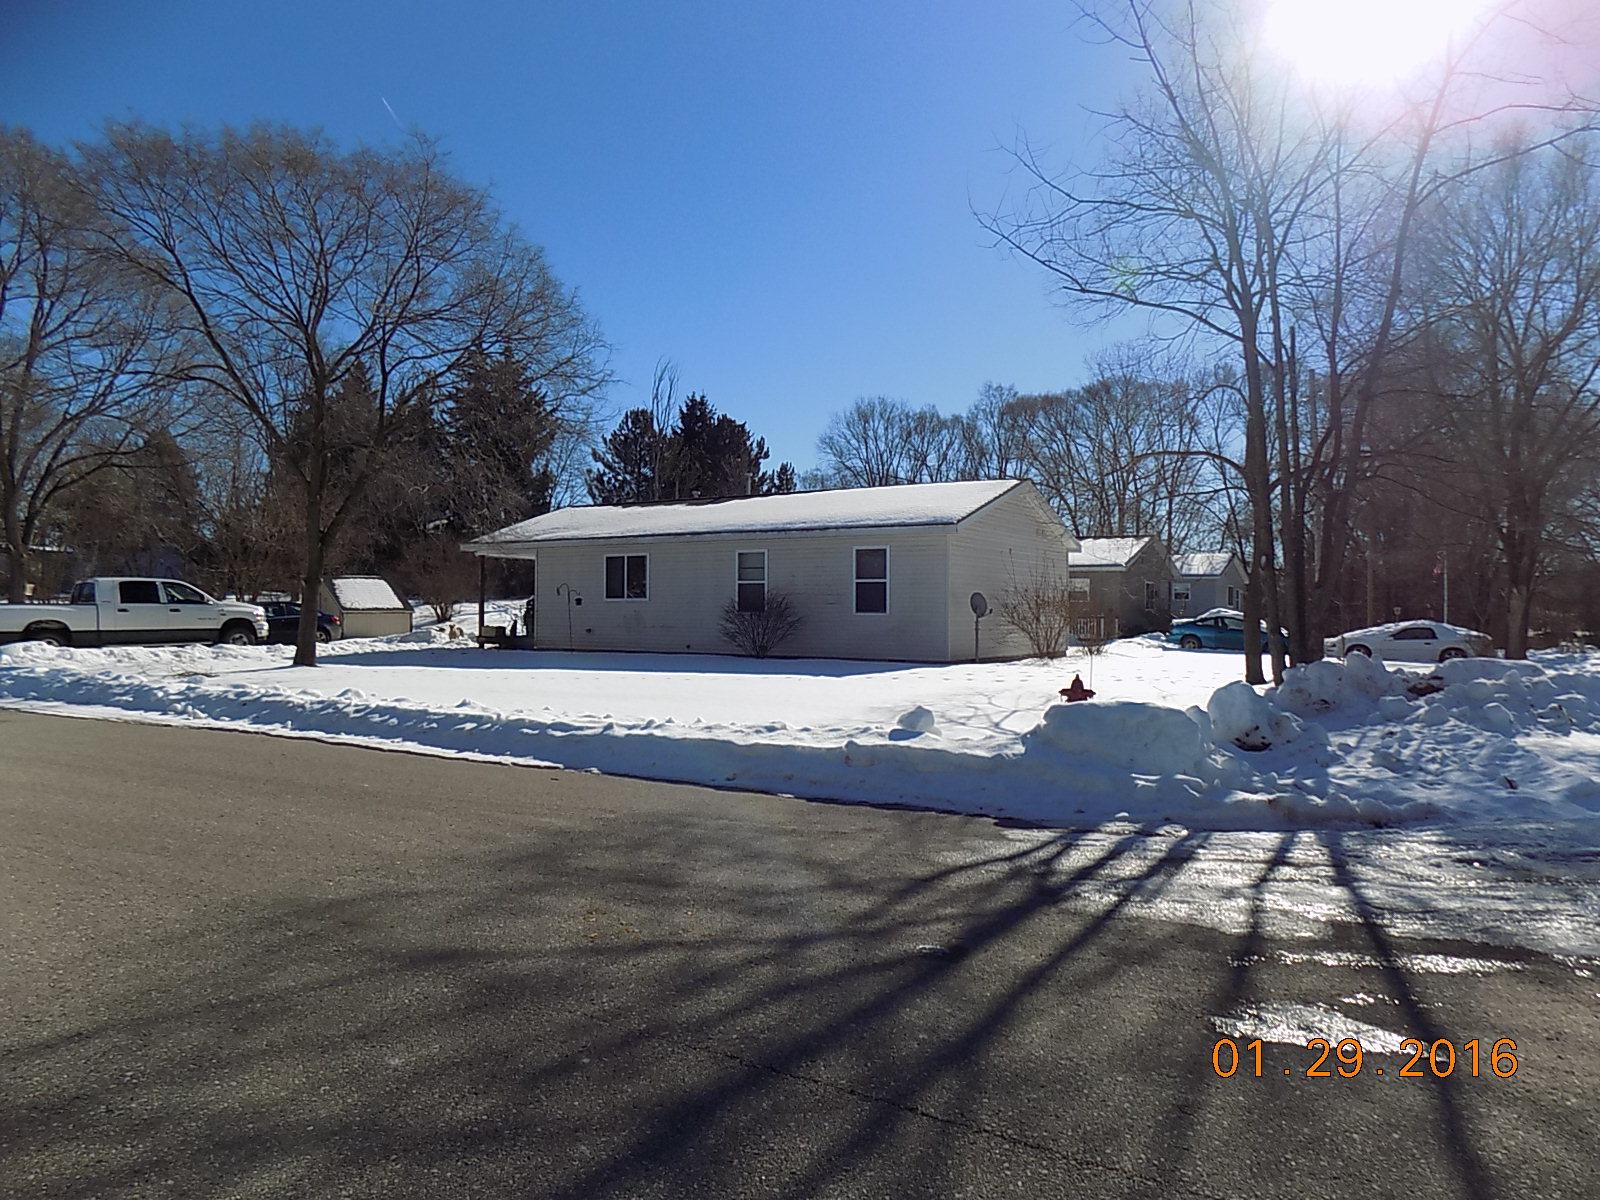 709 Beech St, Gladwin, Michigan 48624